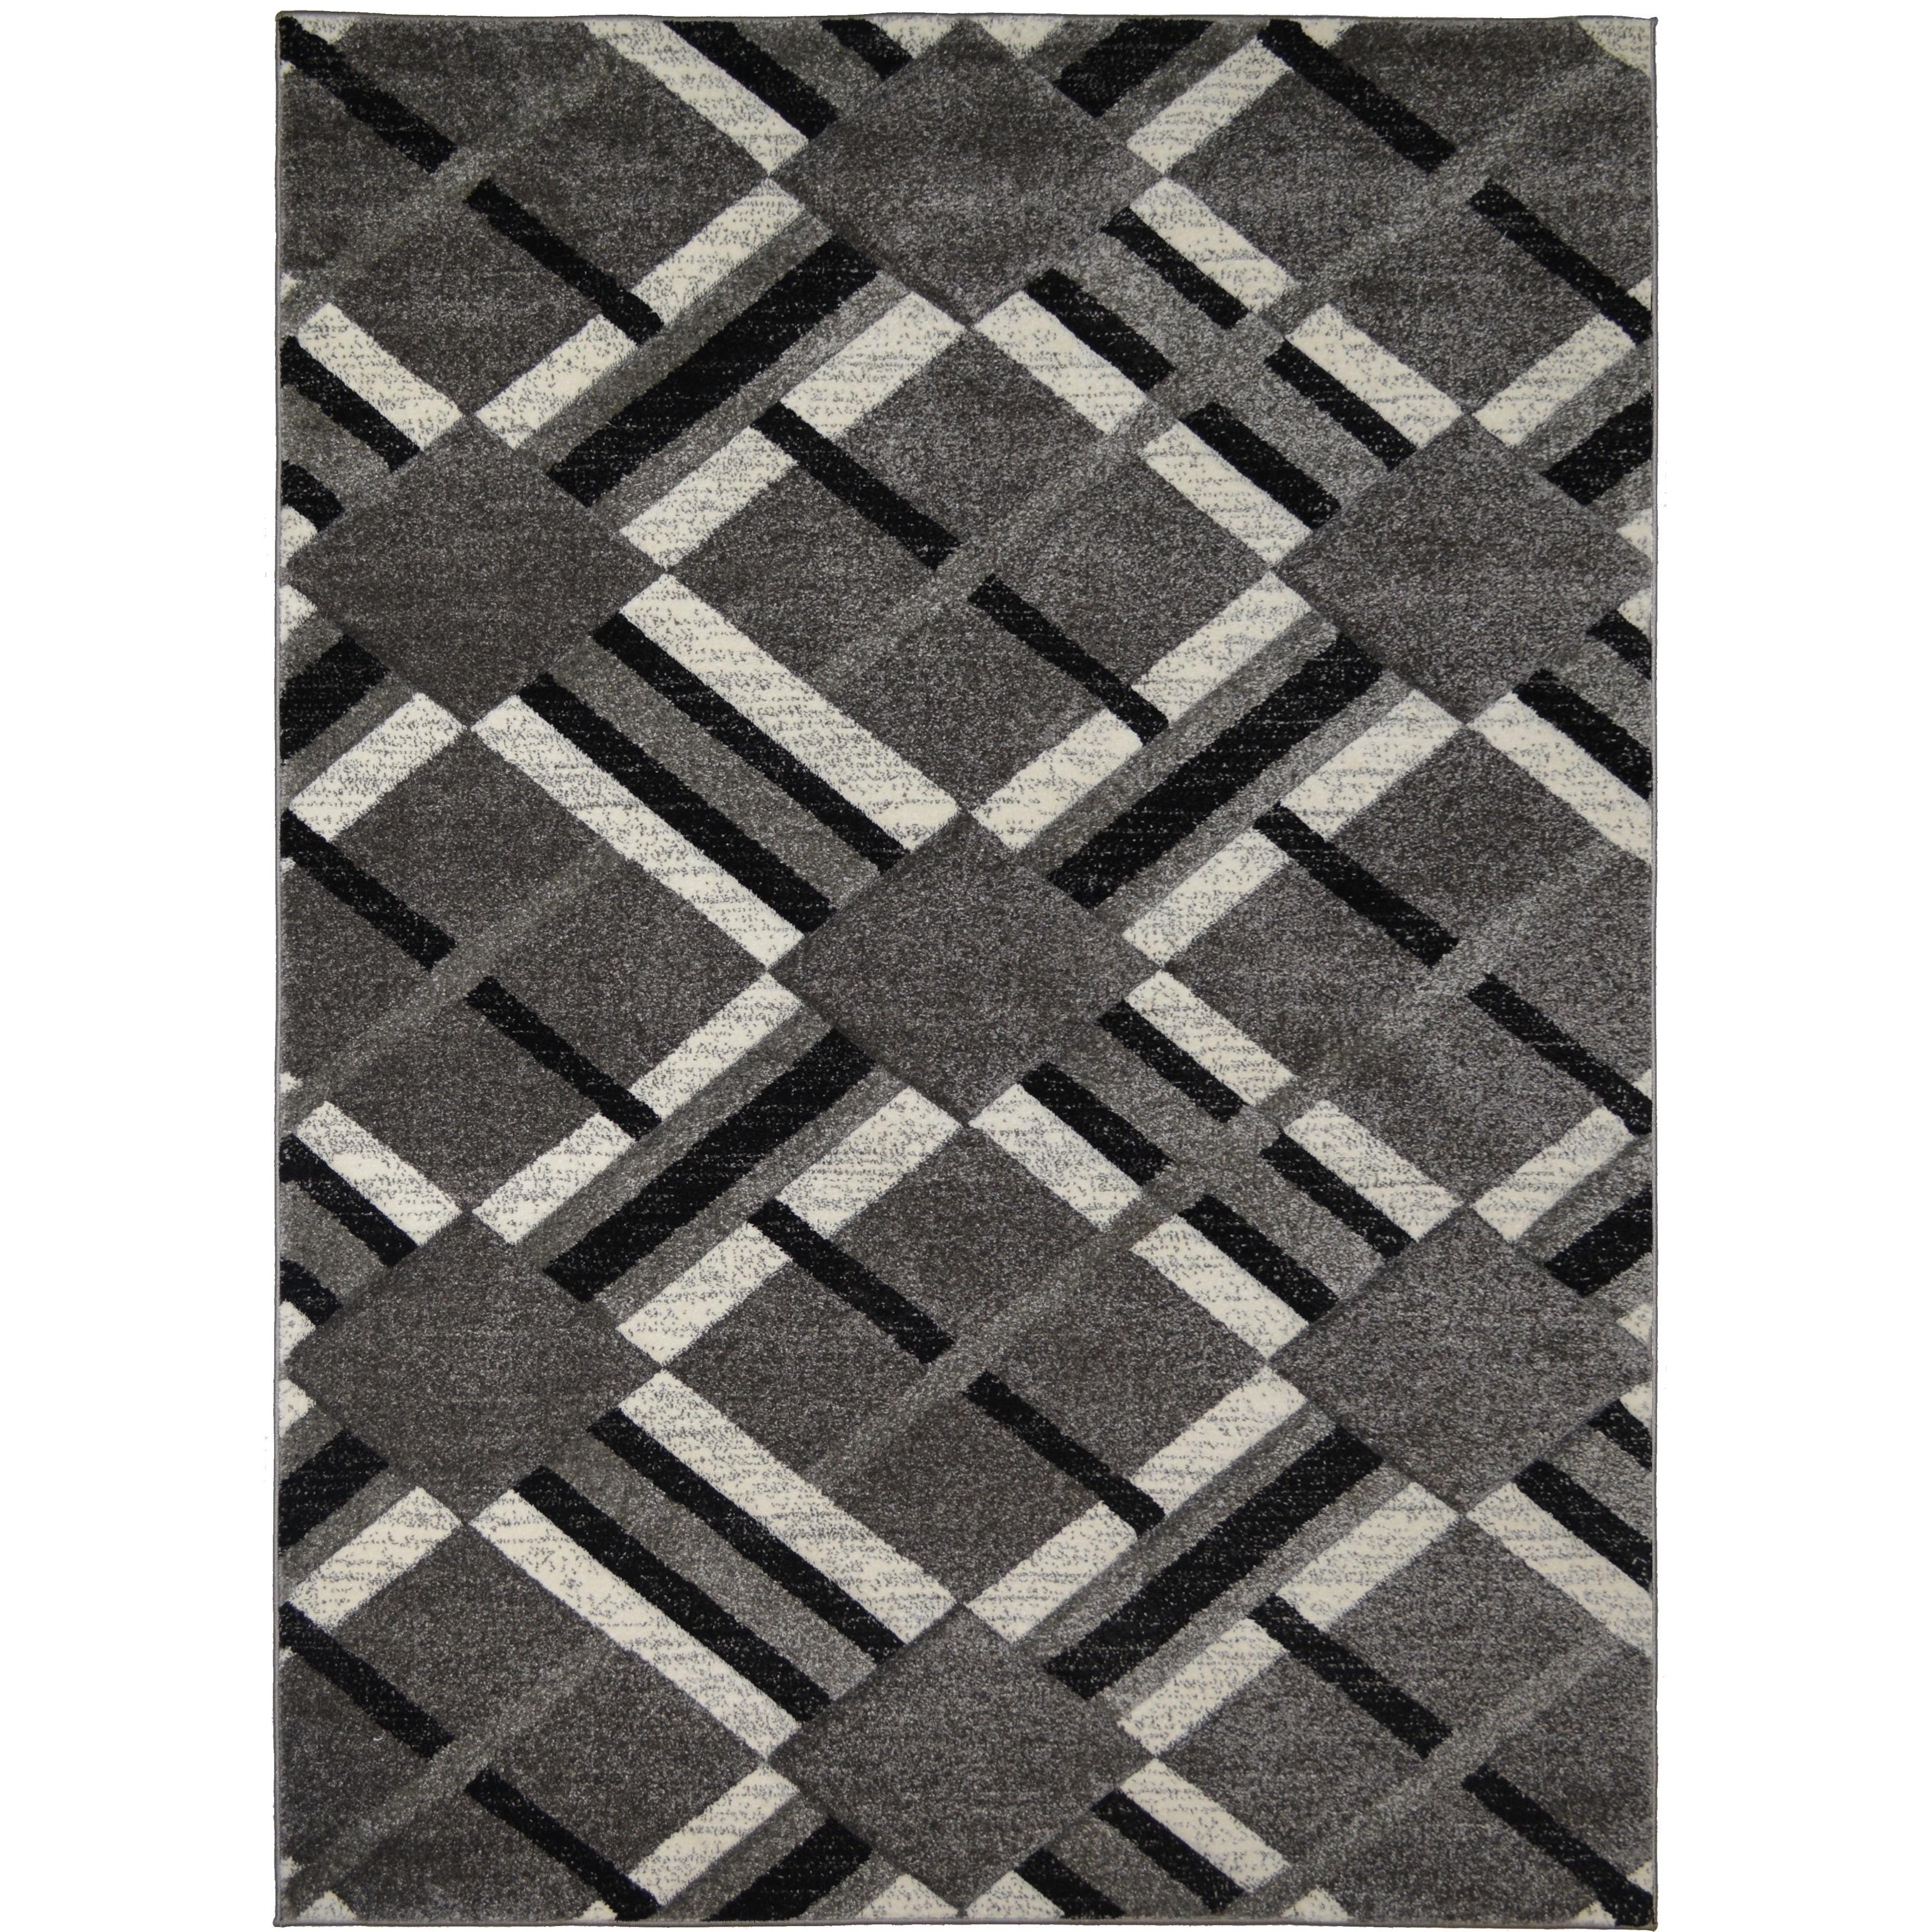 Axel Easton Black Gray Contemporary Geometric Area Rug Overstock 27089979